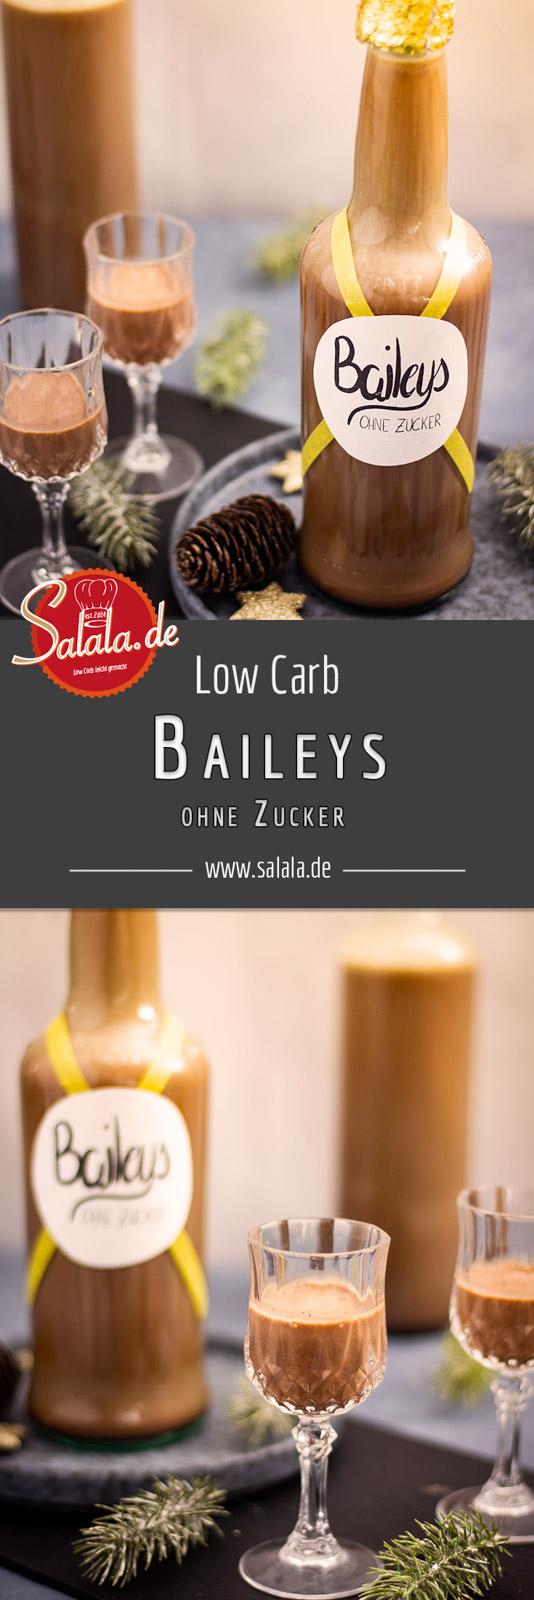 #baileys #baileysohnezucker #lowcarb #lowcarbrezepte #baileysrezept #baileysselbermachen #zuckerfrei